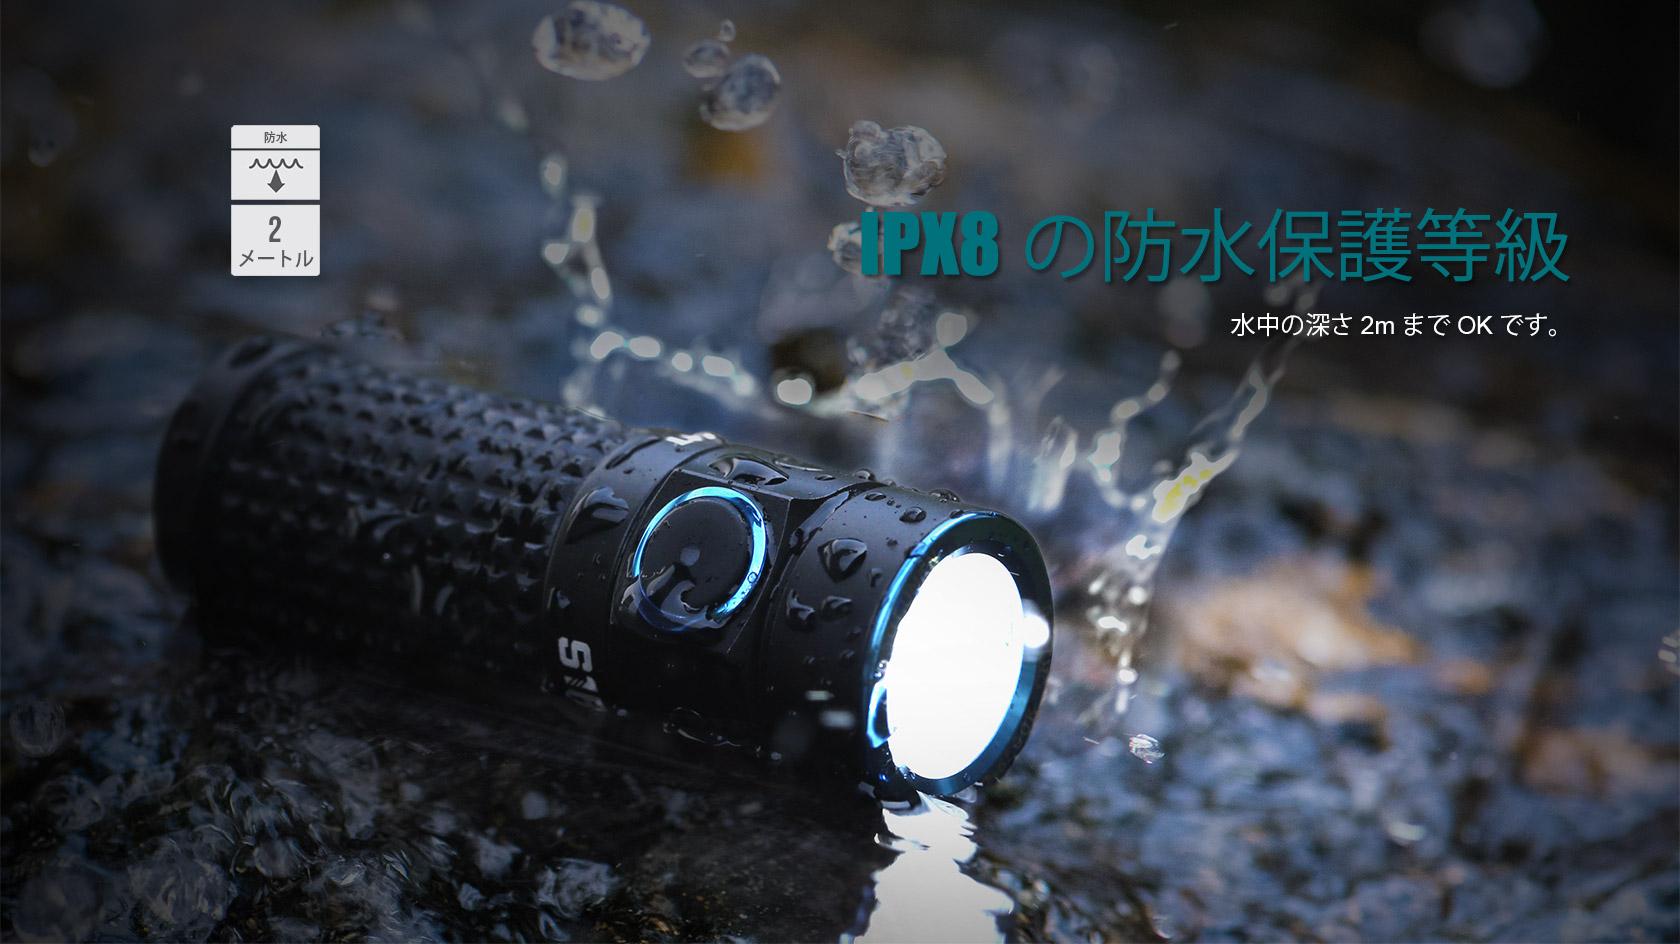 S1R BATONIIはipx8防水機能を備えています